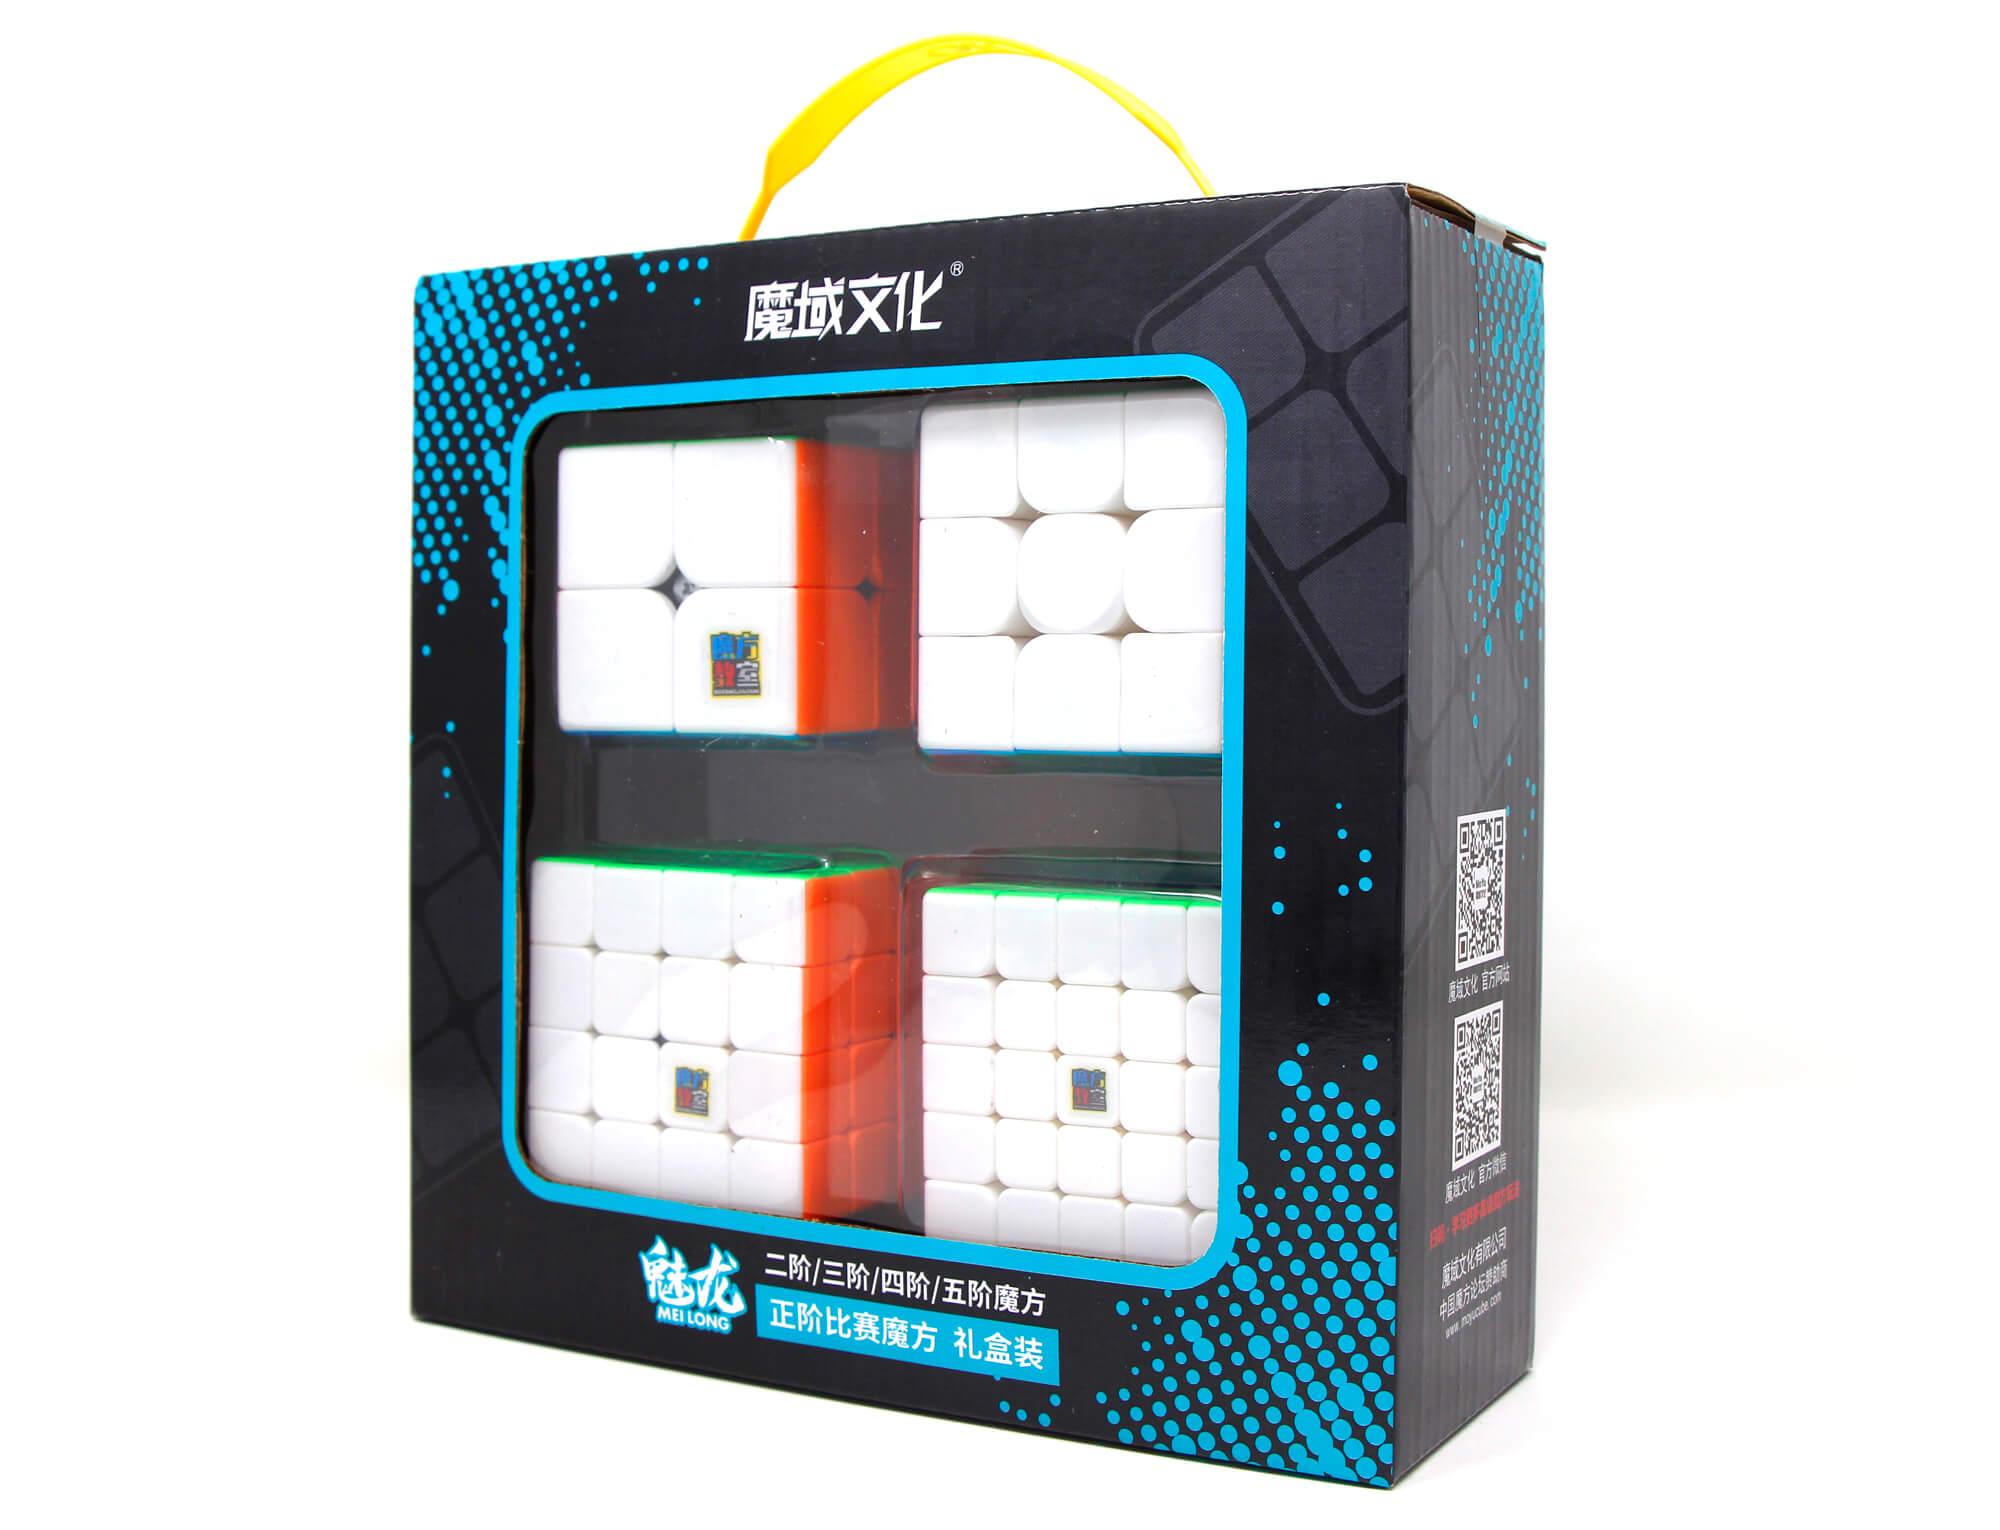 BOX KIT 2X2 3X3 4X4 5X5 MOYU COLOR